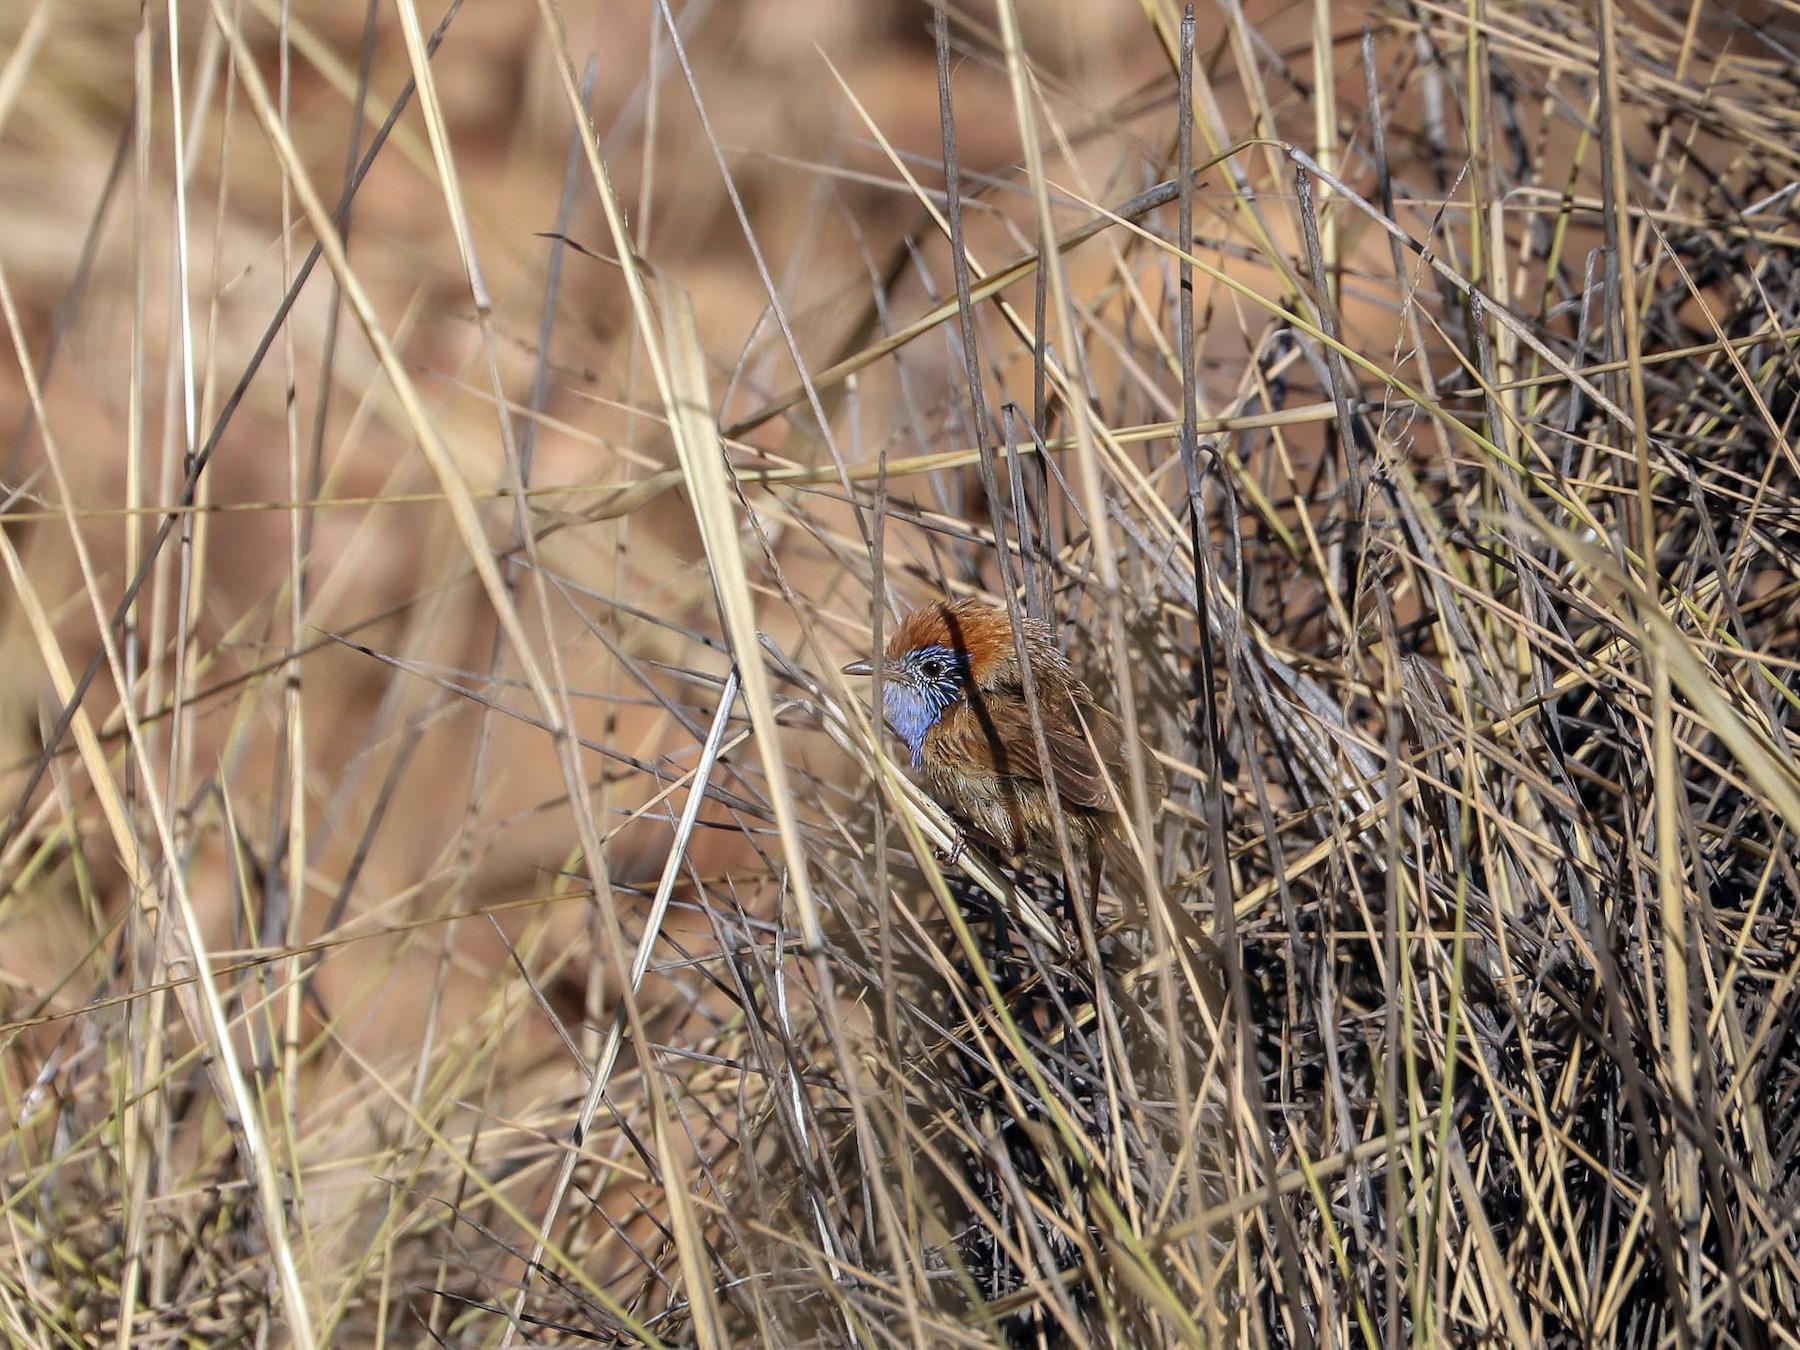 Rufous-crowned Emuwren - Ged Tranter